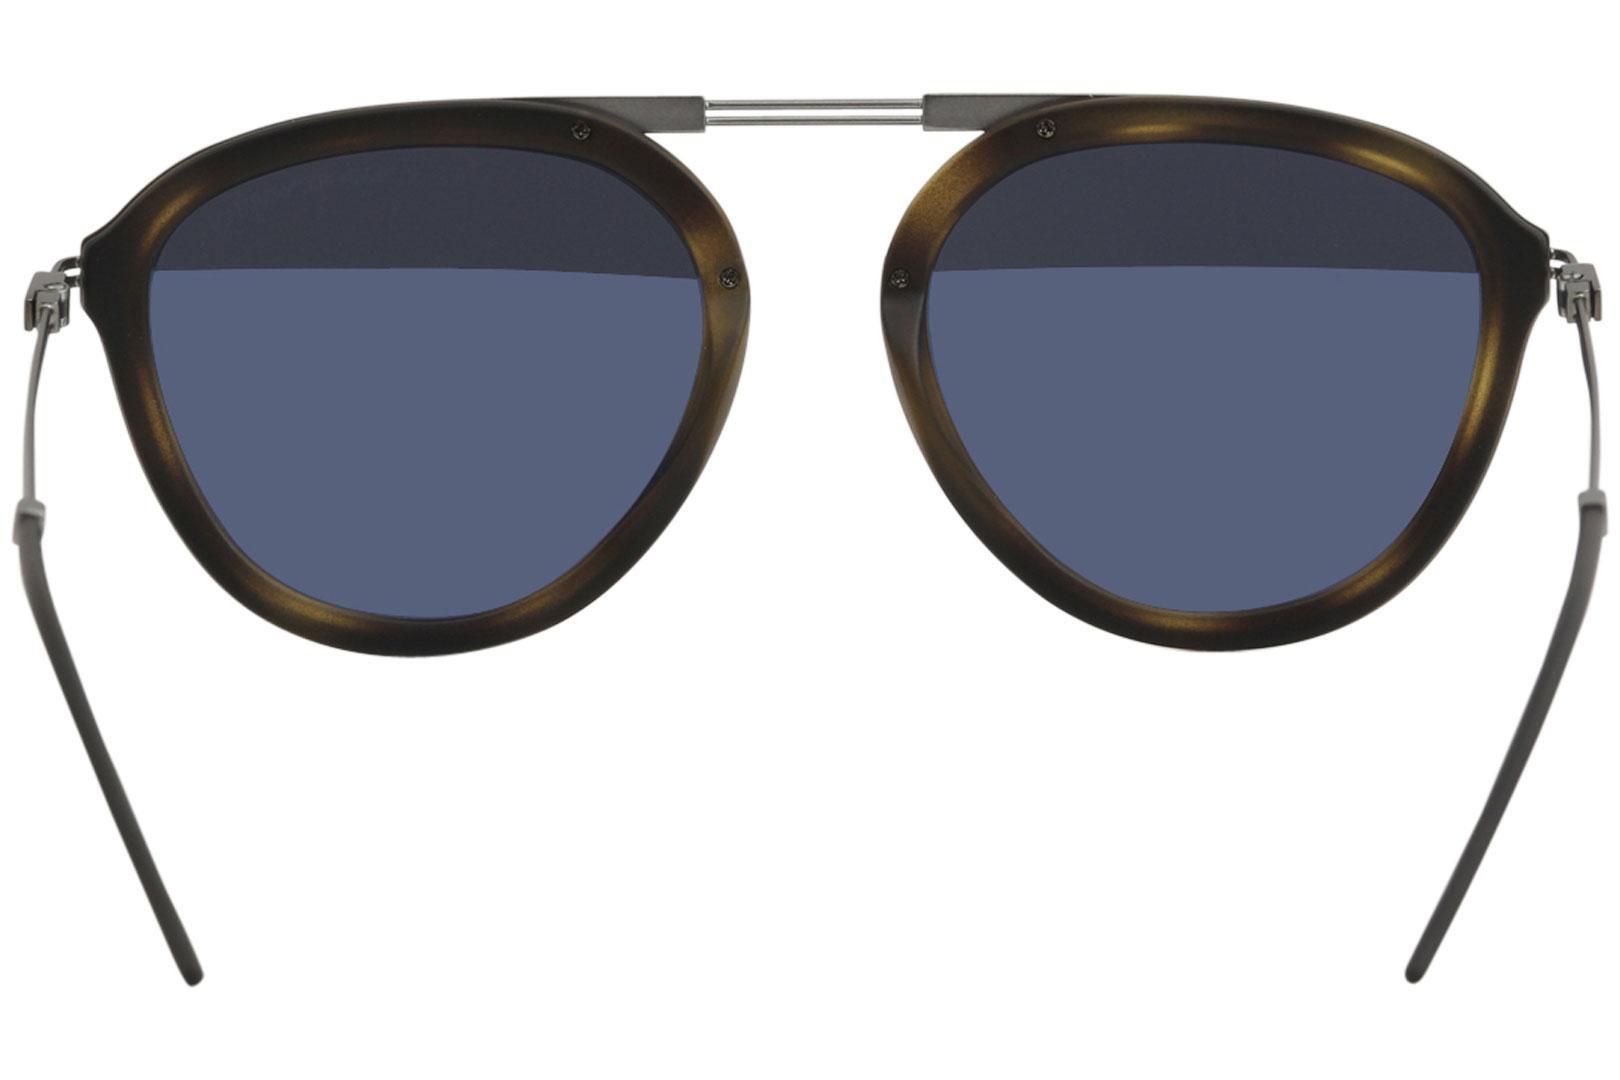 6449ffba8b91 Emporio Armani Men s EA2056 EA 2056 Fashion Pilot Sunglasses